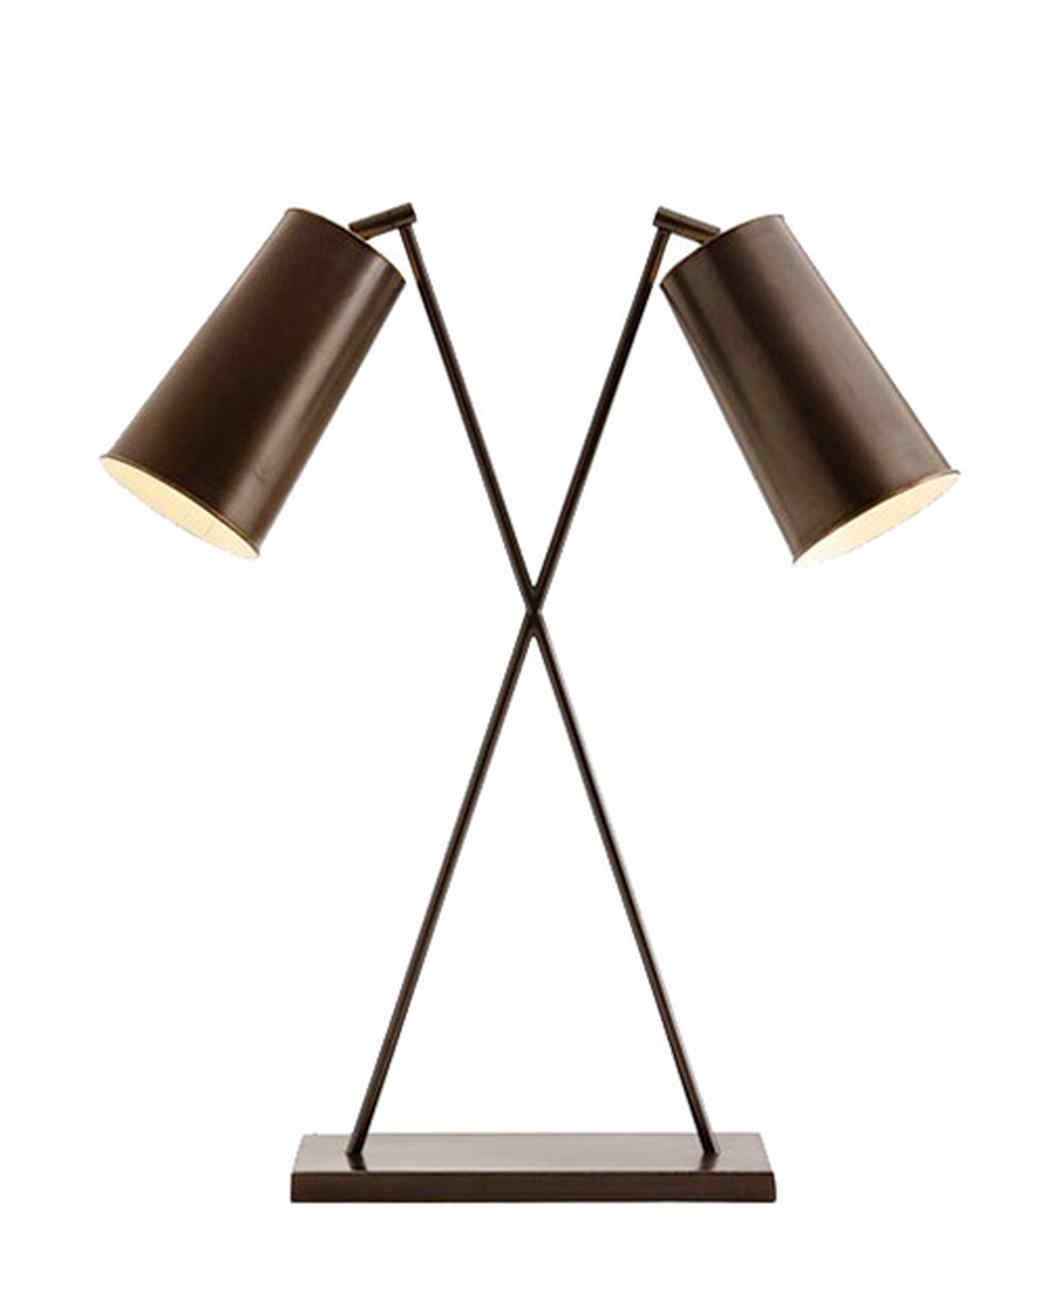 ms106295_1010_haus_interior_iron_cross_lamp.jpg